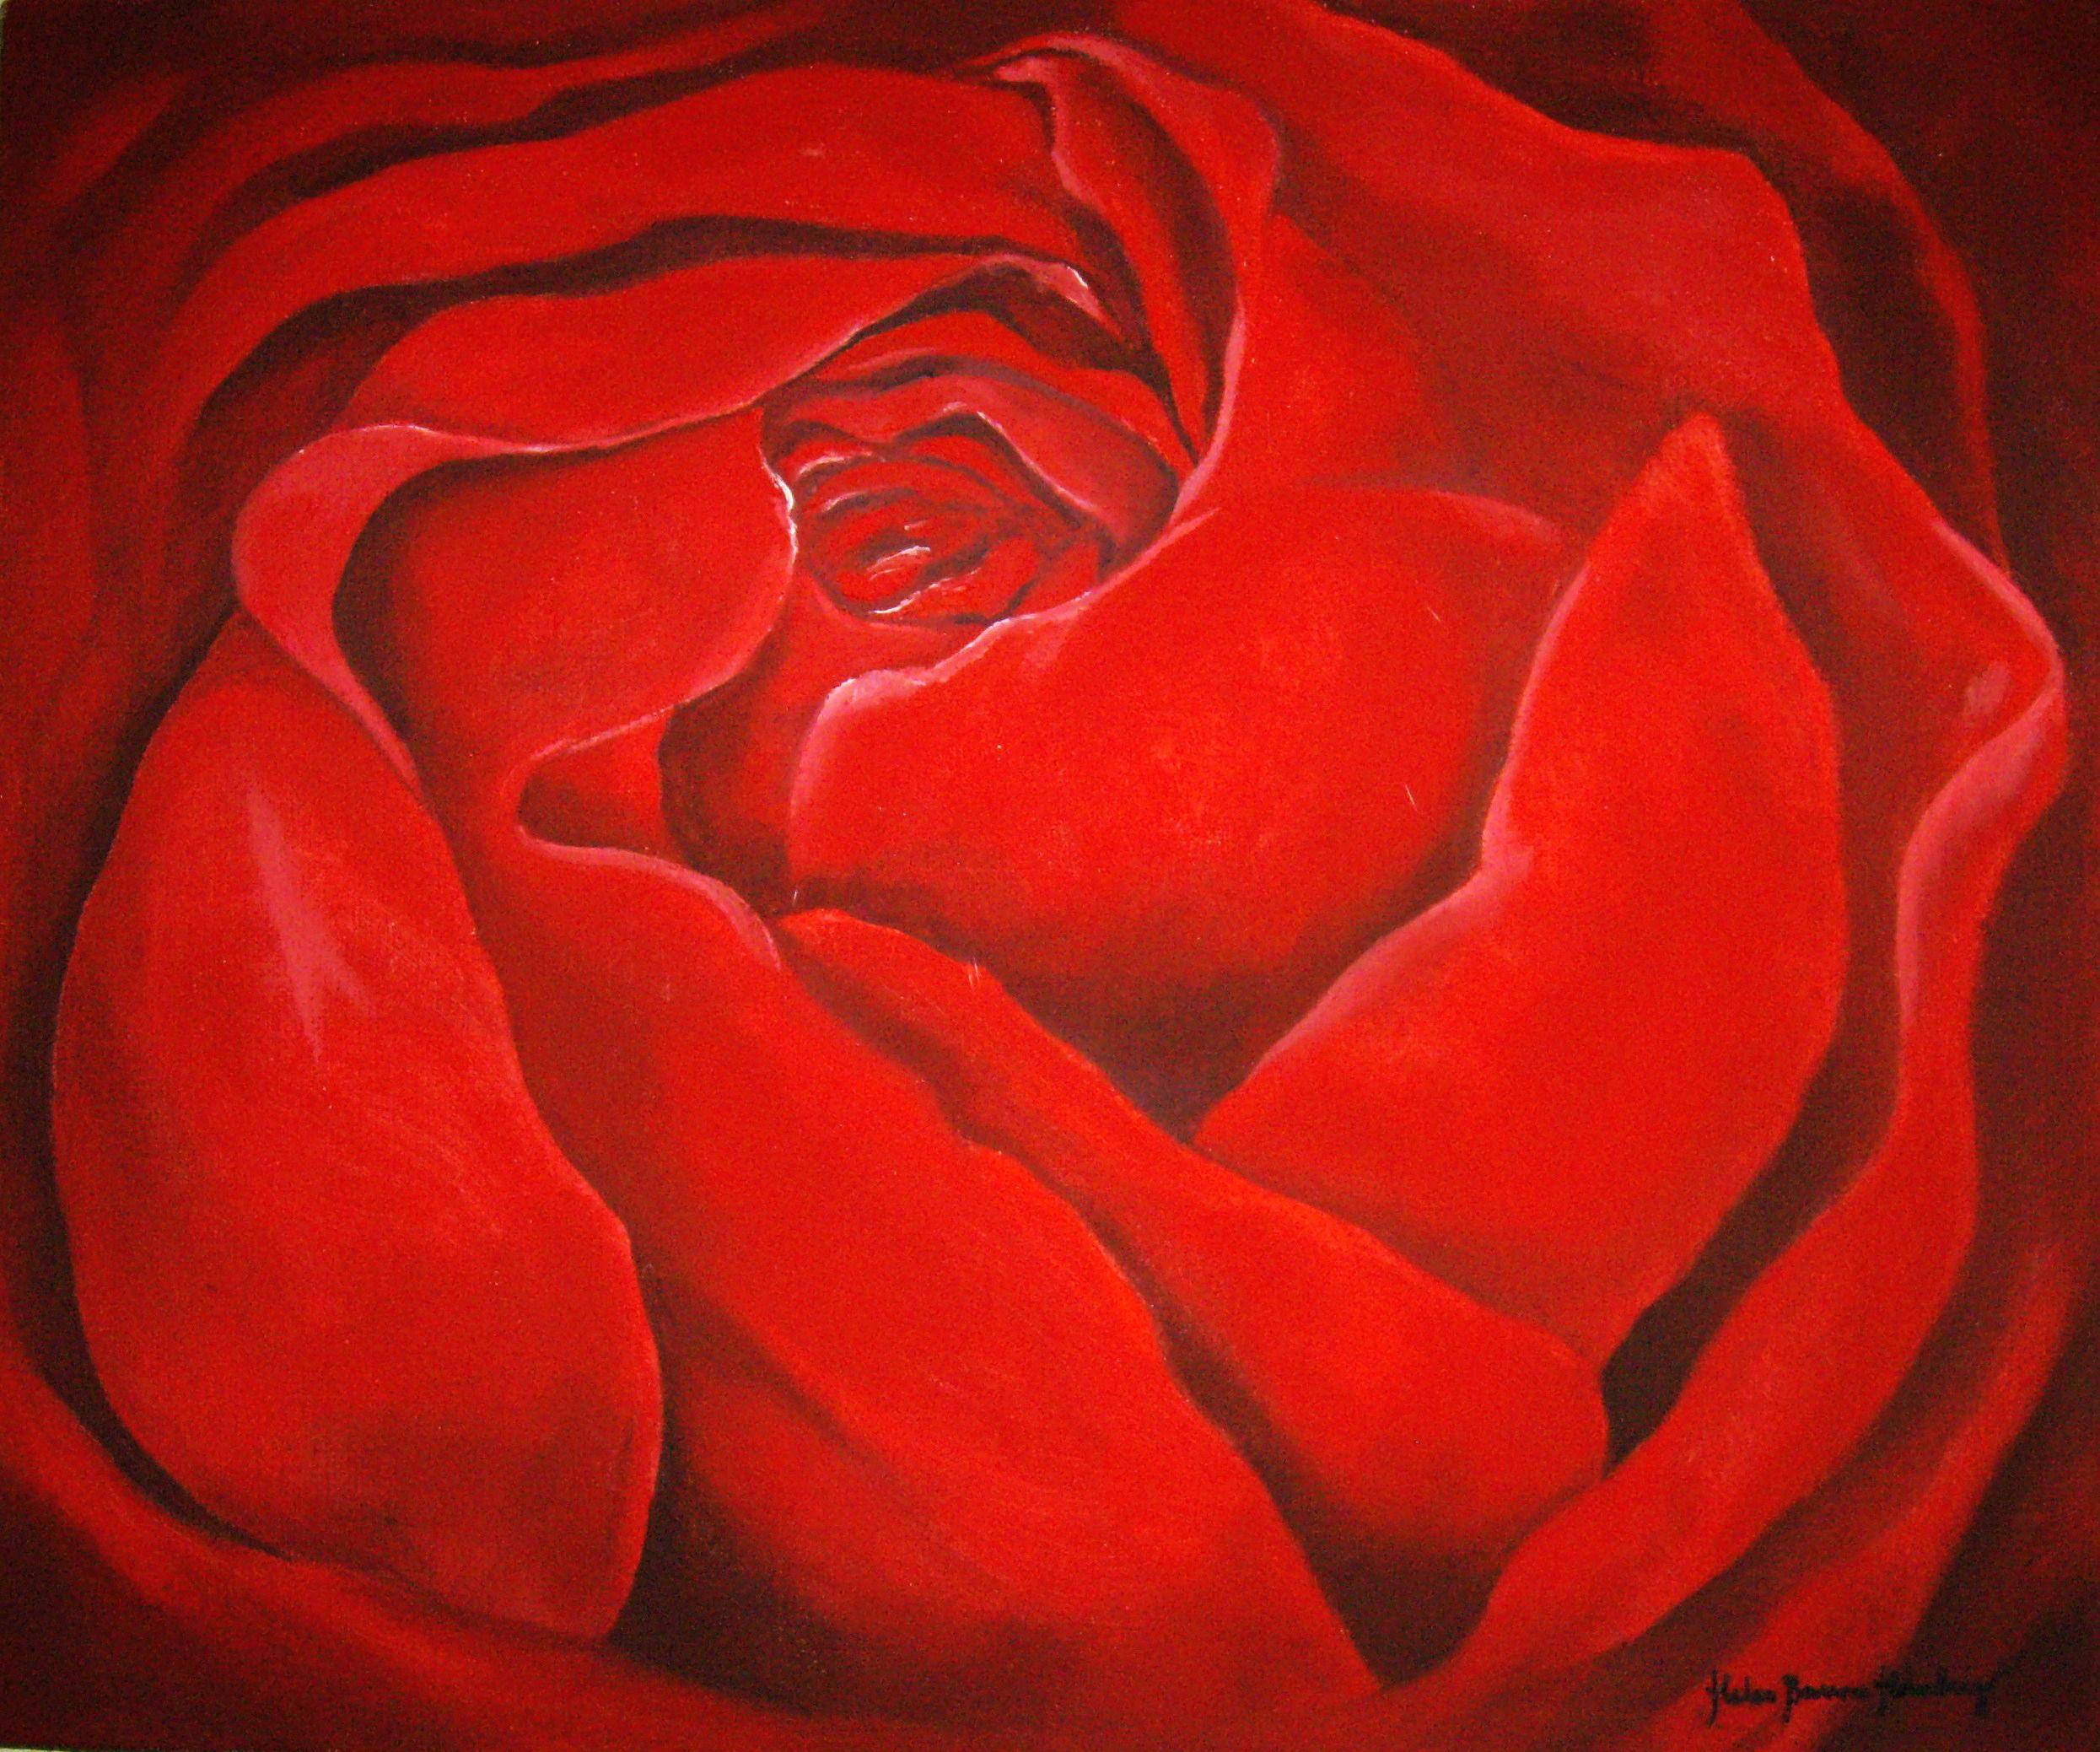 Röd ros 503